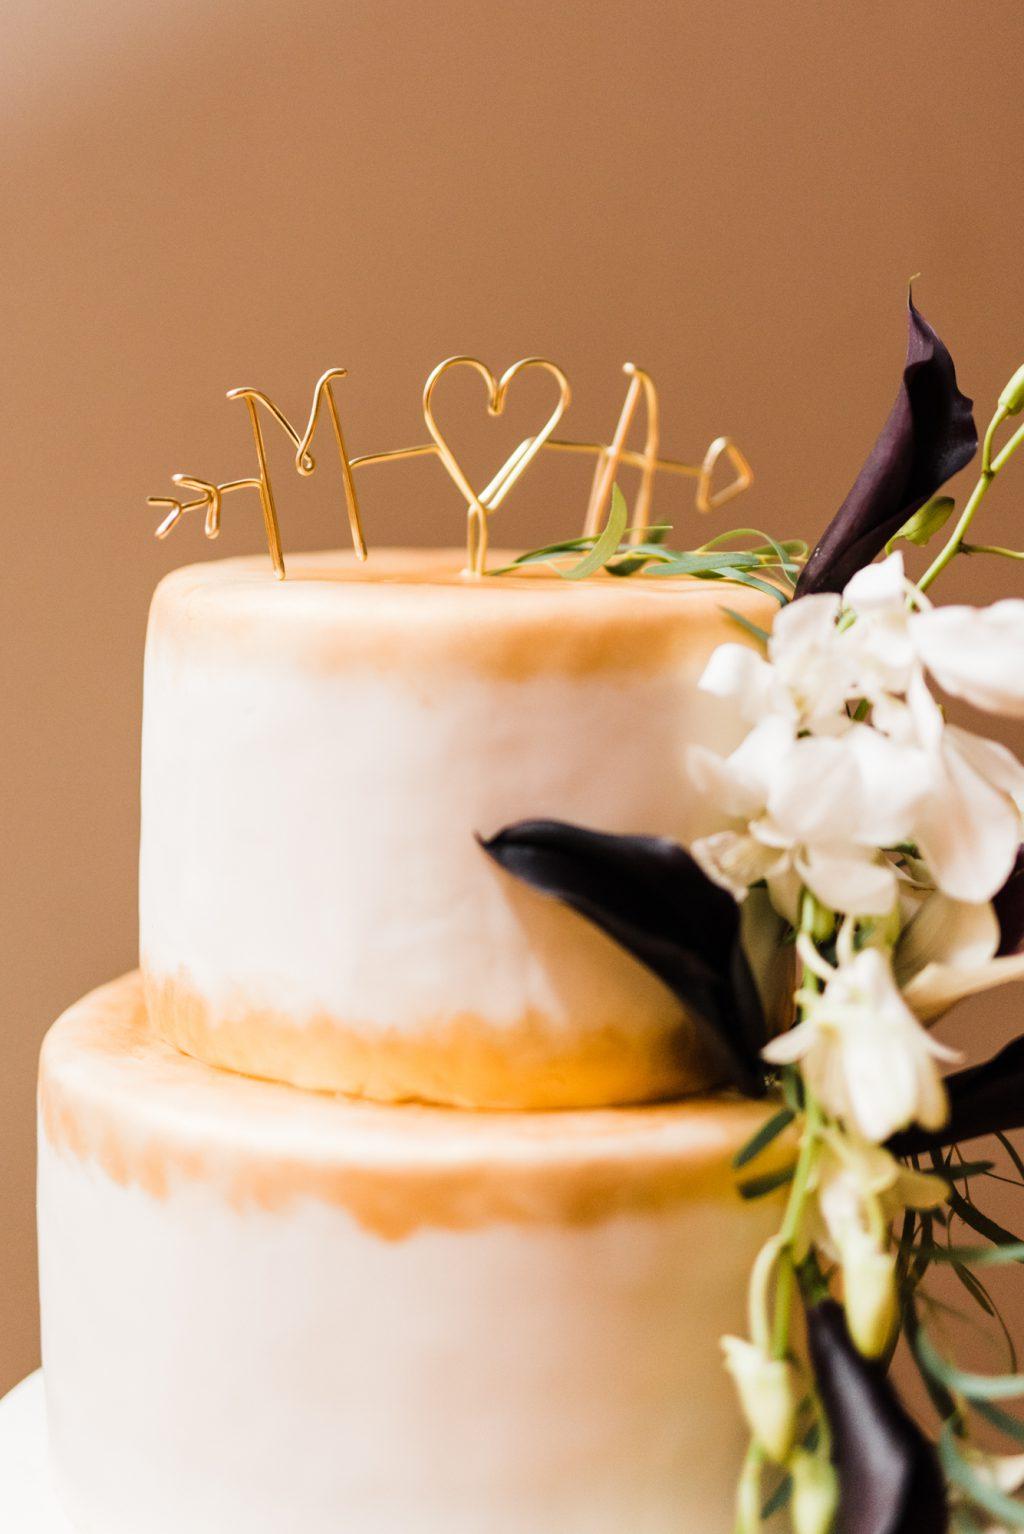 haleyrichterphoto-front-and-palmer-spring-wedding-rodin-museum-loews-hotel-philadelphia-149